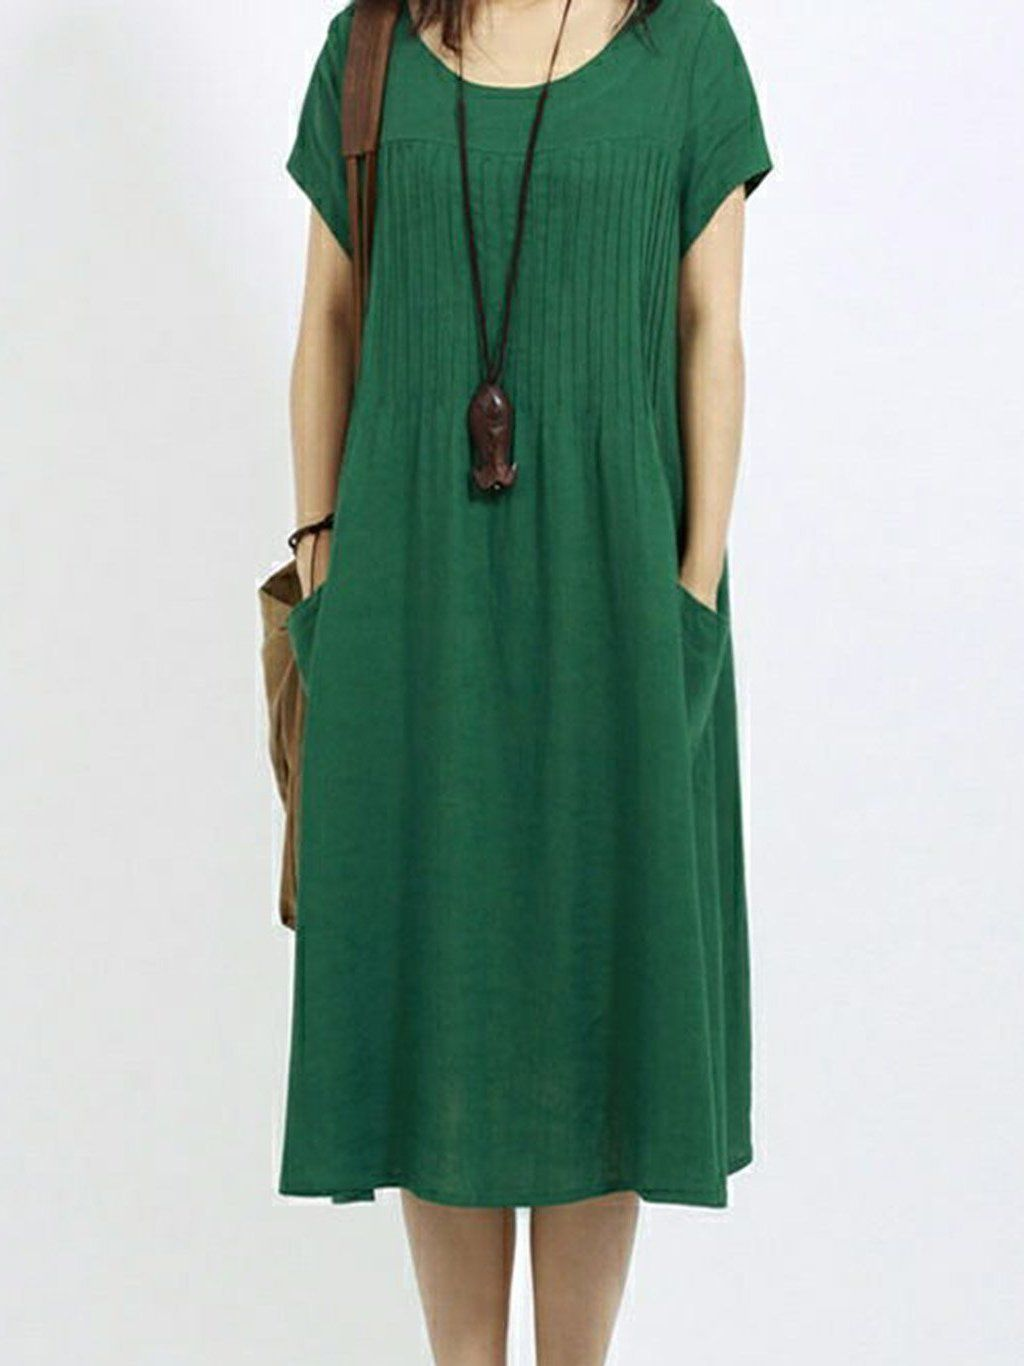 0c480c53e92 Shop Dresses - minachic Shirt Dress Casual Dresses Daytime Shift Crew Neck  Short Sleeve Pockets Casual